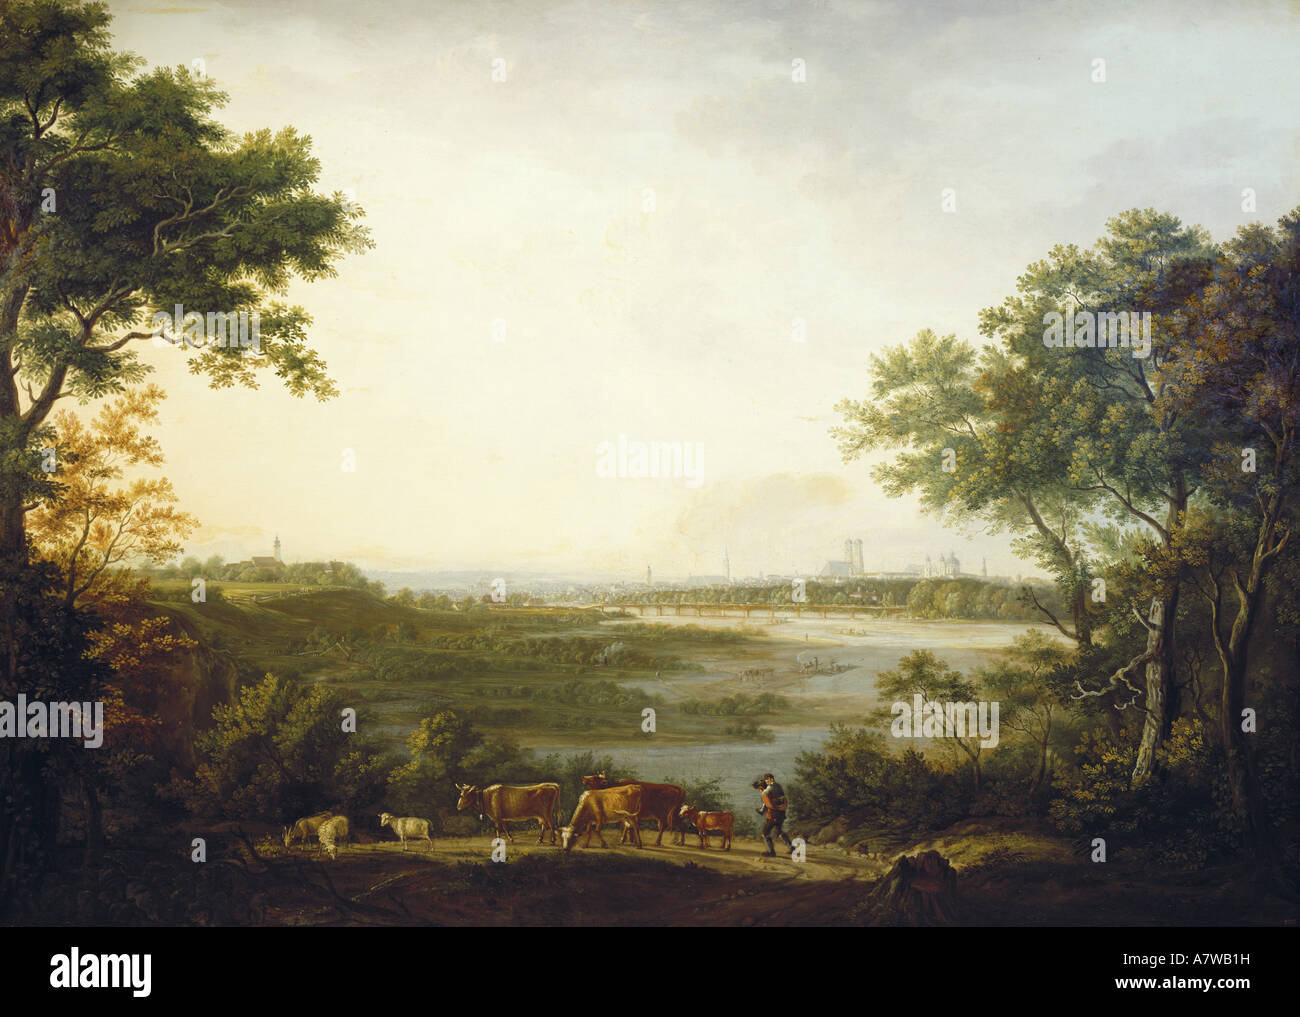 "Belle arti, Dorner, Johann Jakob, il sambuco (1766 - 1813), 'Ansicht von München"", pittura, 1806, Immagini Stock"